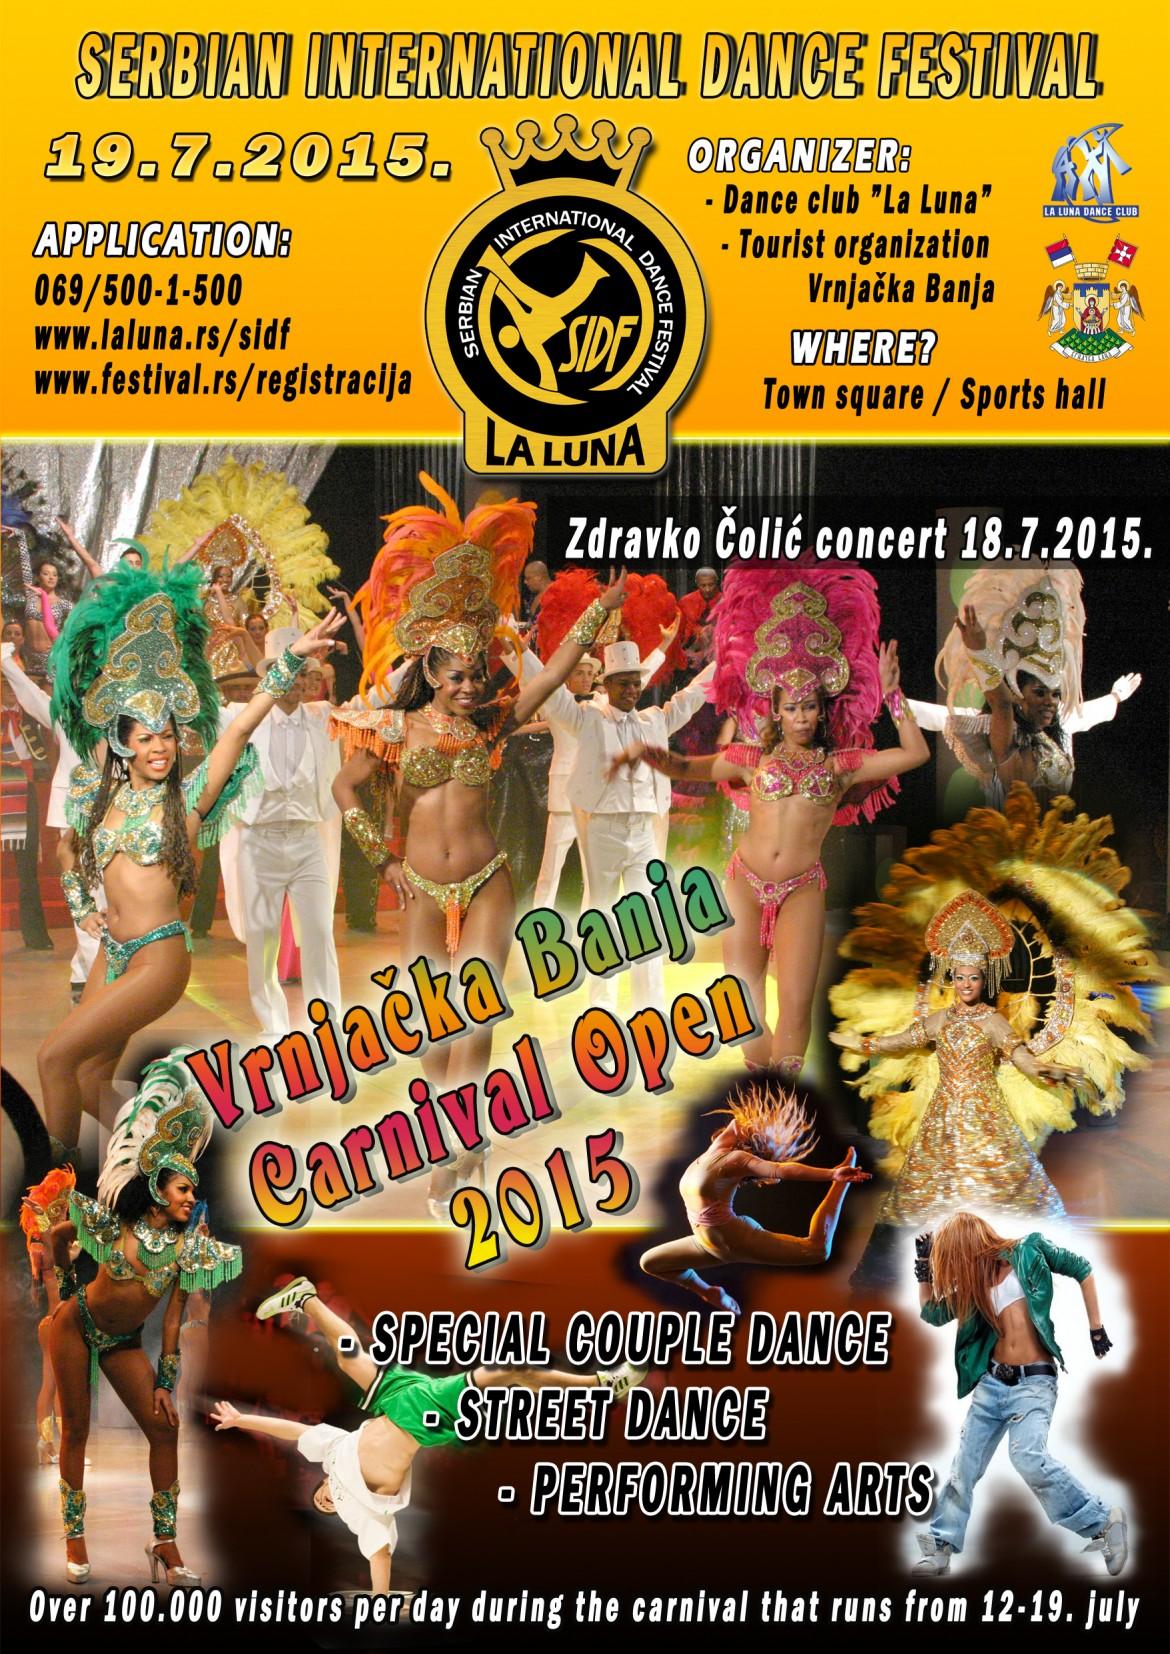 plakat A4 vrnjacka banja open 2015 - karneval open